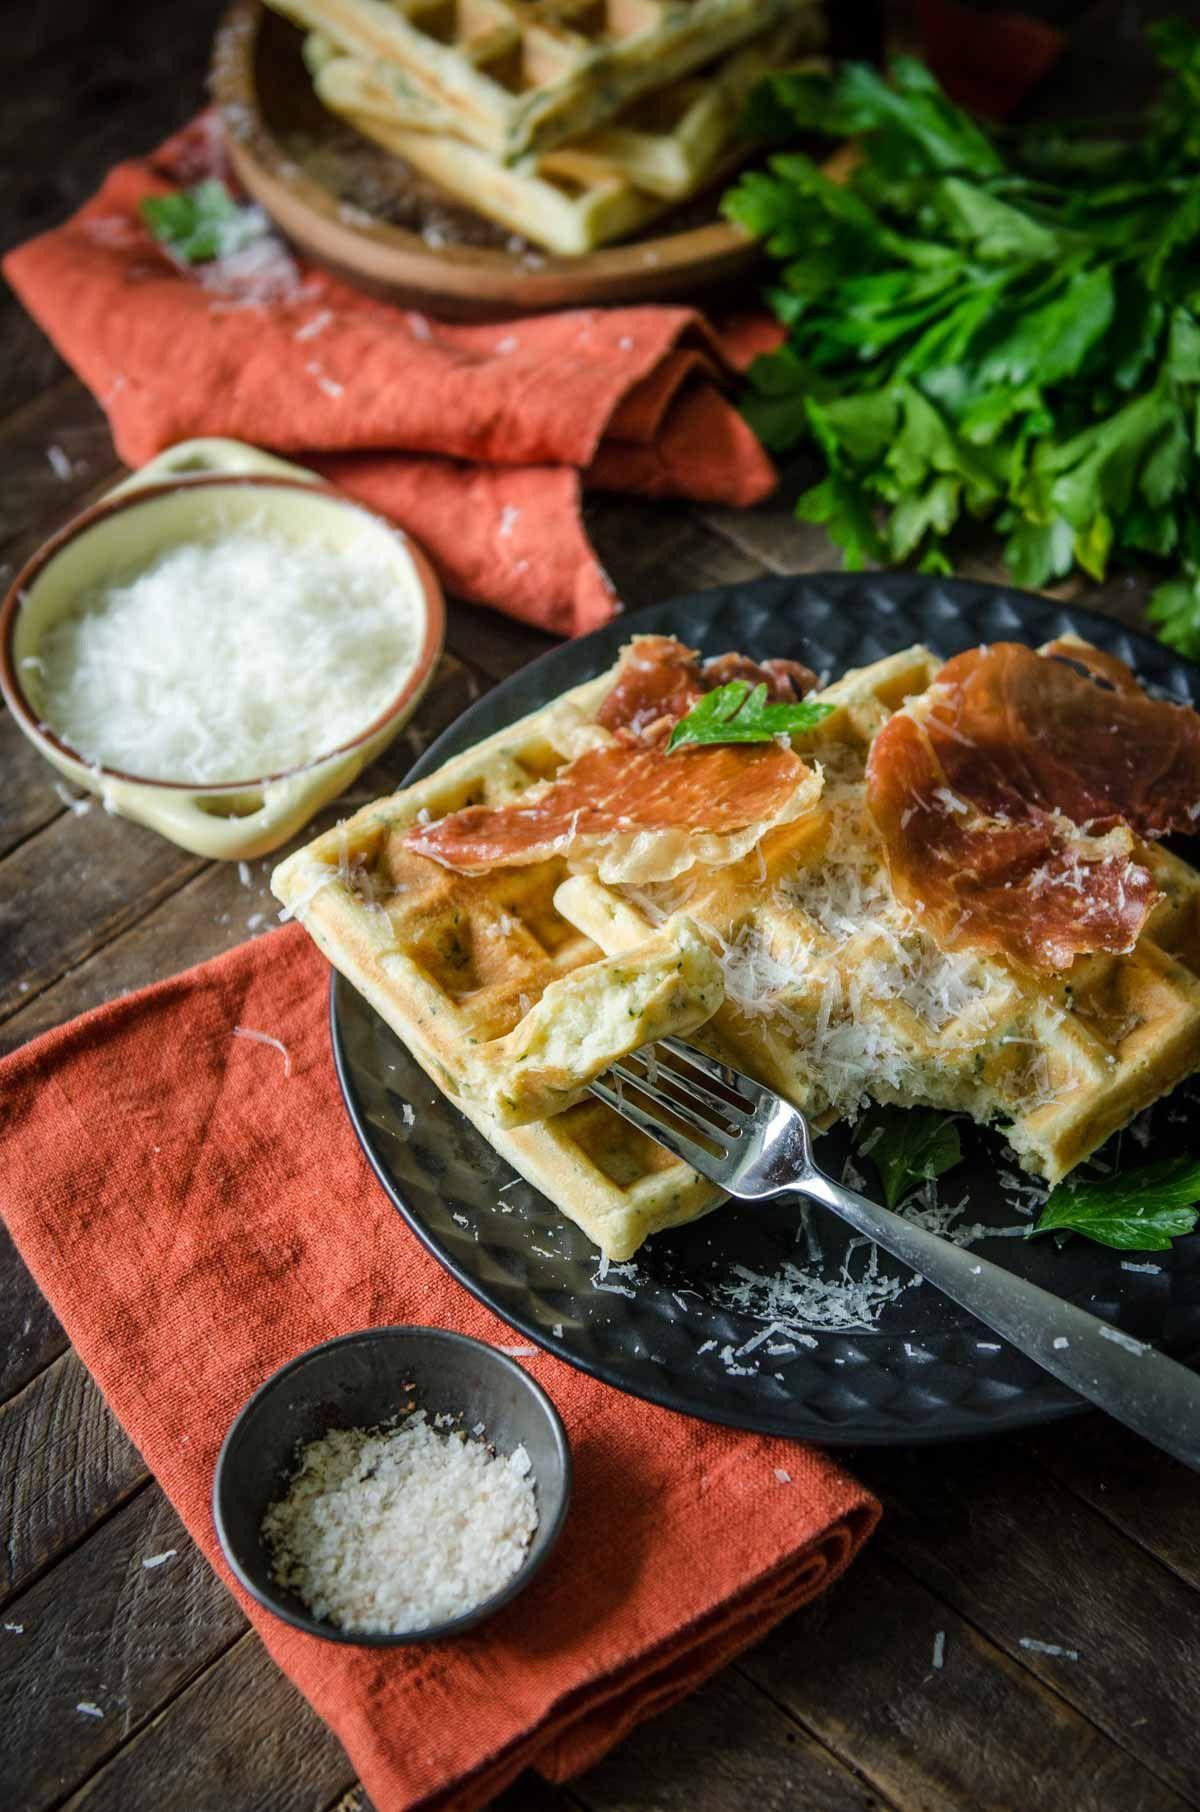 Parmesan and parsley savory waffles recipe savory waffles parmesan and parsley savory waffles italian dinner recipesbest forumfinder Gallery